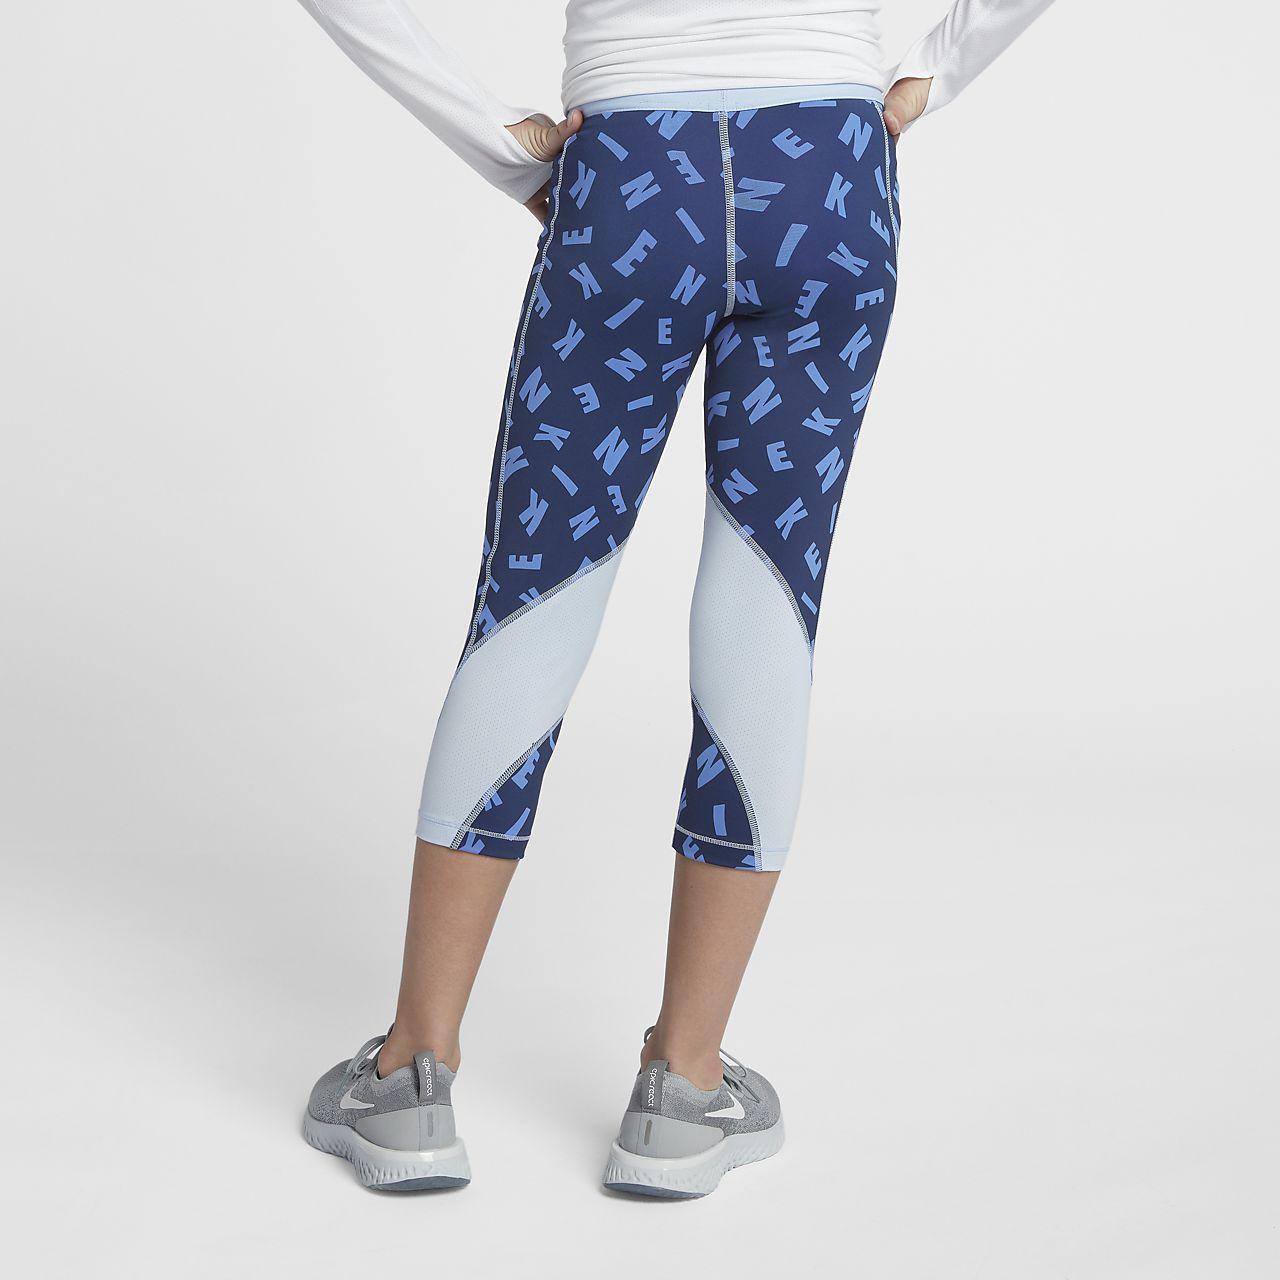 Nike Dry Little Kids' Training Pants Binary Blue